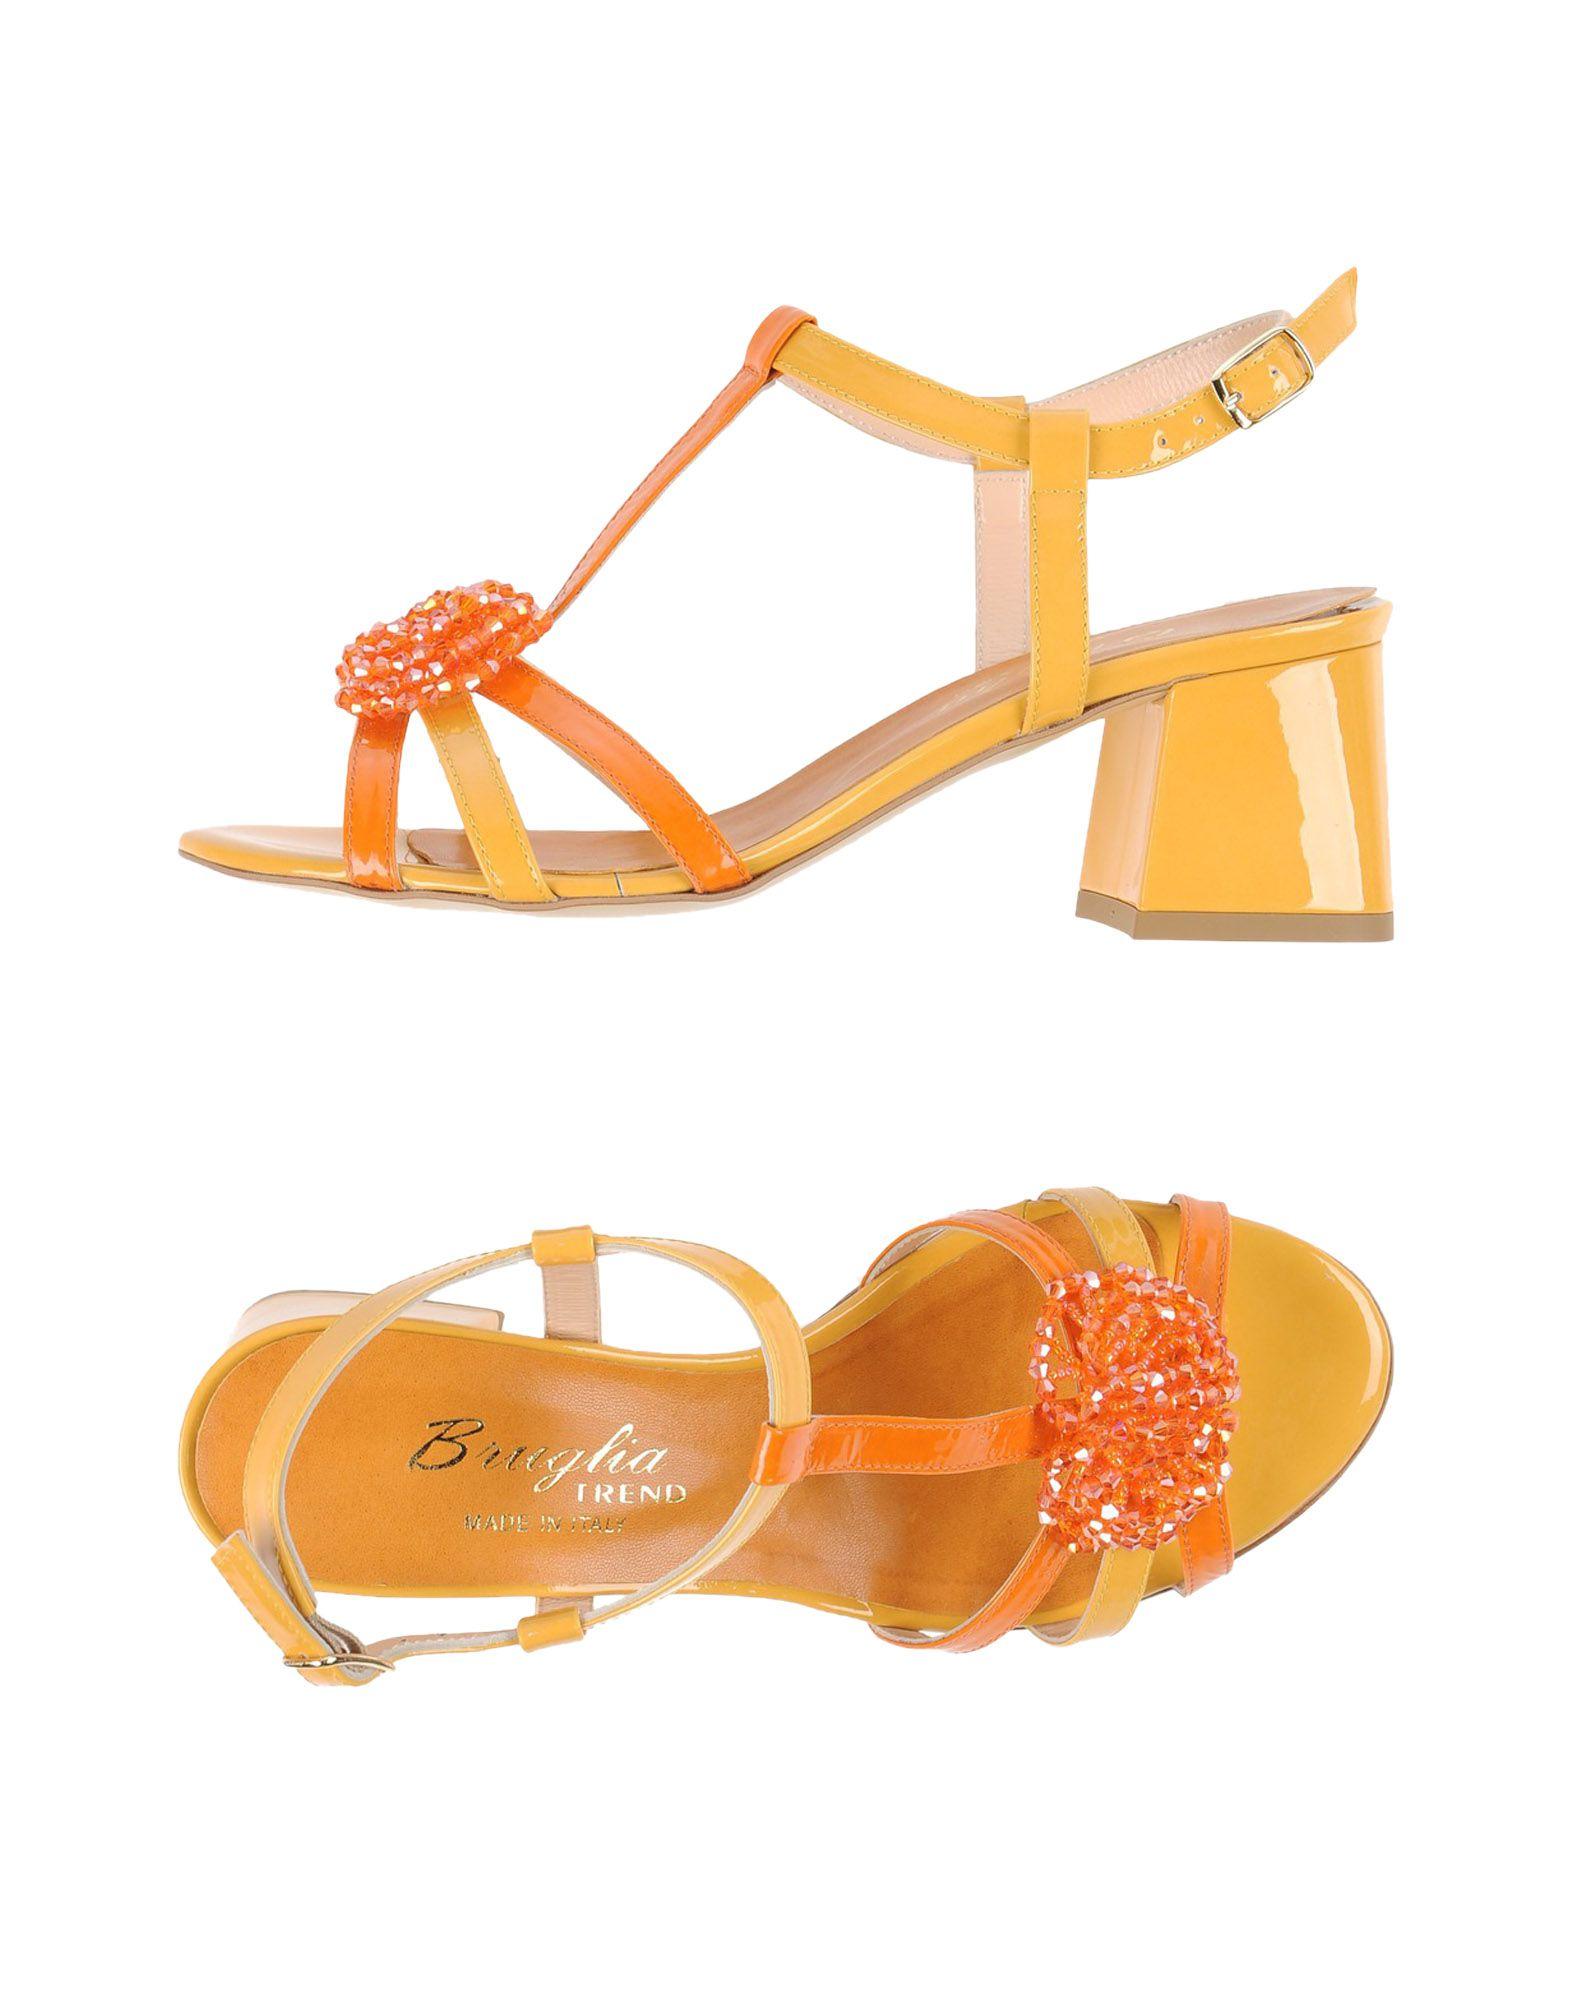 f. lli bruglia sandales - femmes f. f. f. lli bruglia sandales en ligne sur l'australie - 11345806mp 31a166